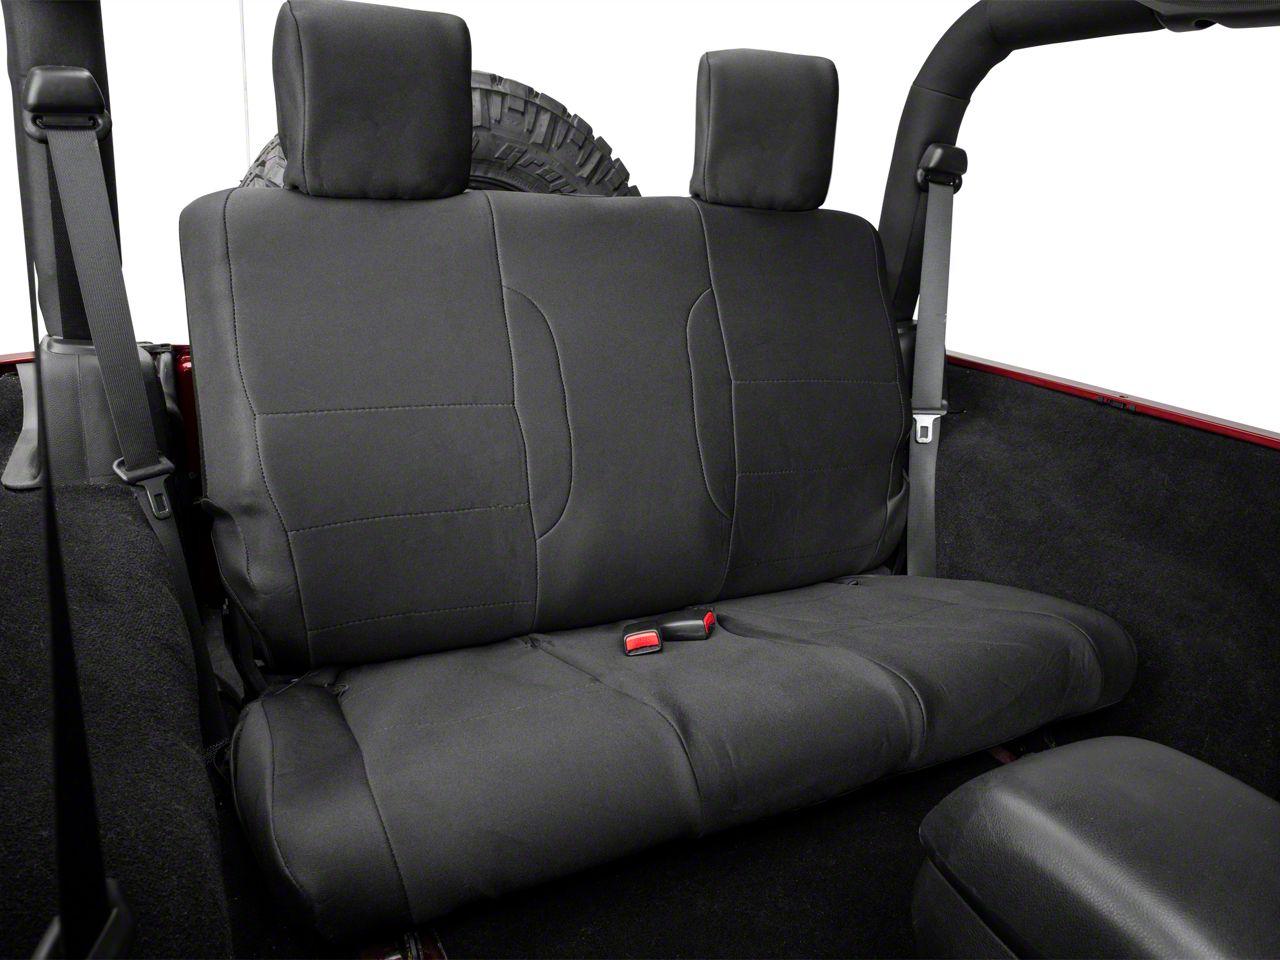 Smittybilt G.E.A.R Custom Fit Seat Cover - Rear (08-12 Jeep Wrangler JK 4 Door)